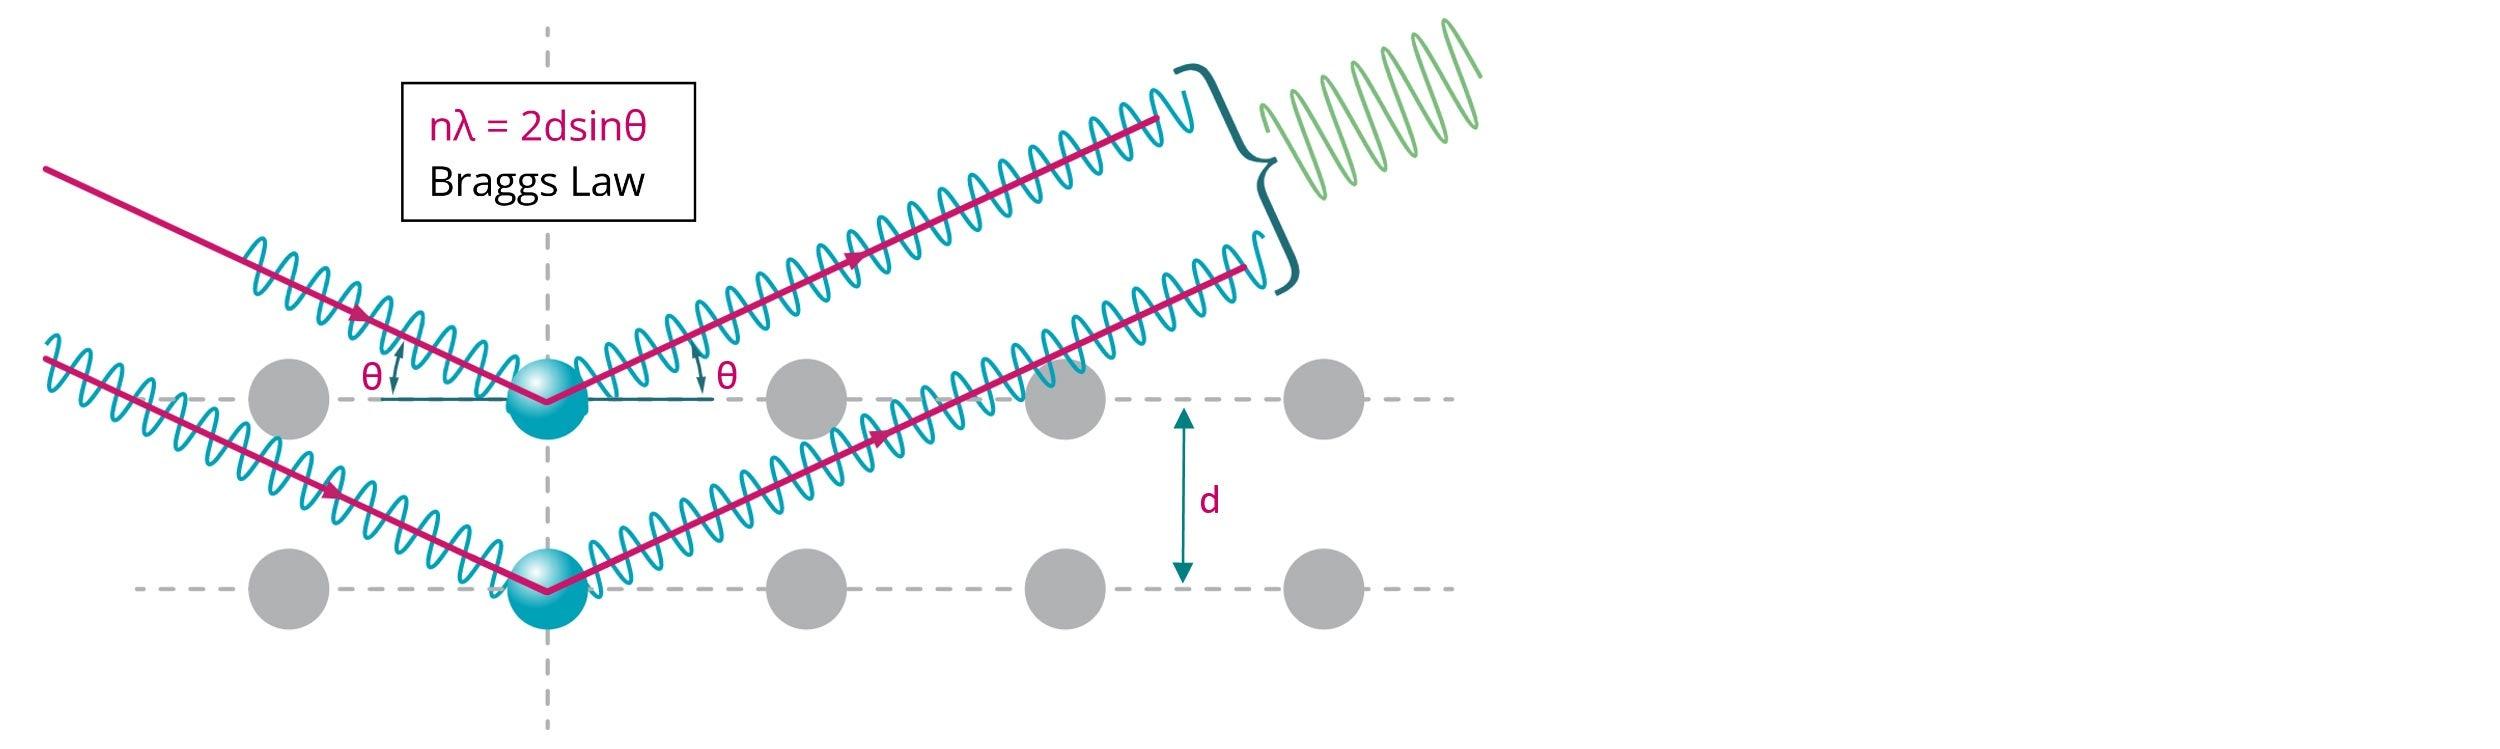 Fig-1-WP201201CharacterizationCatalyticMaterialsXRD.jpg